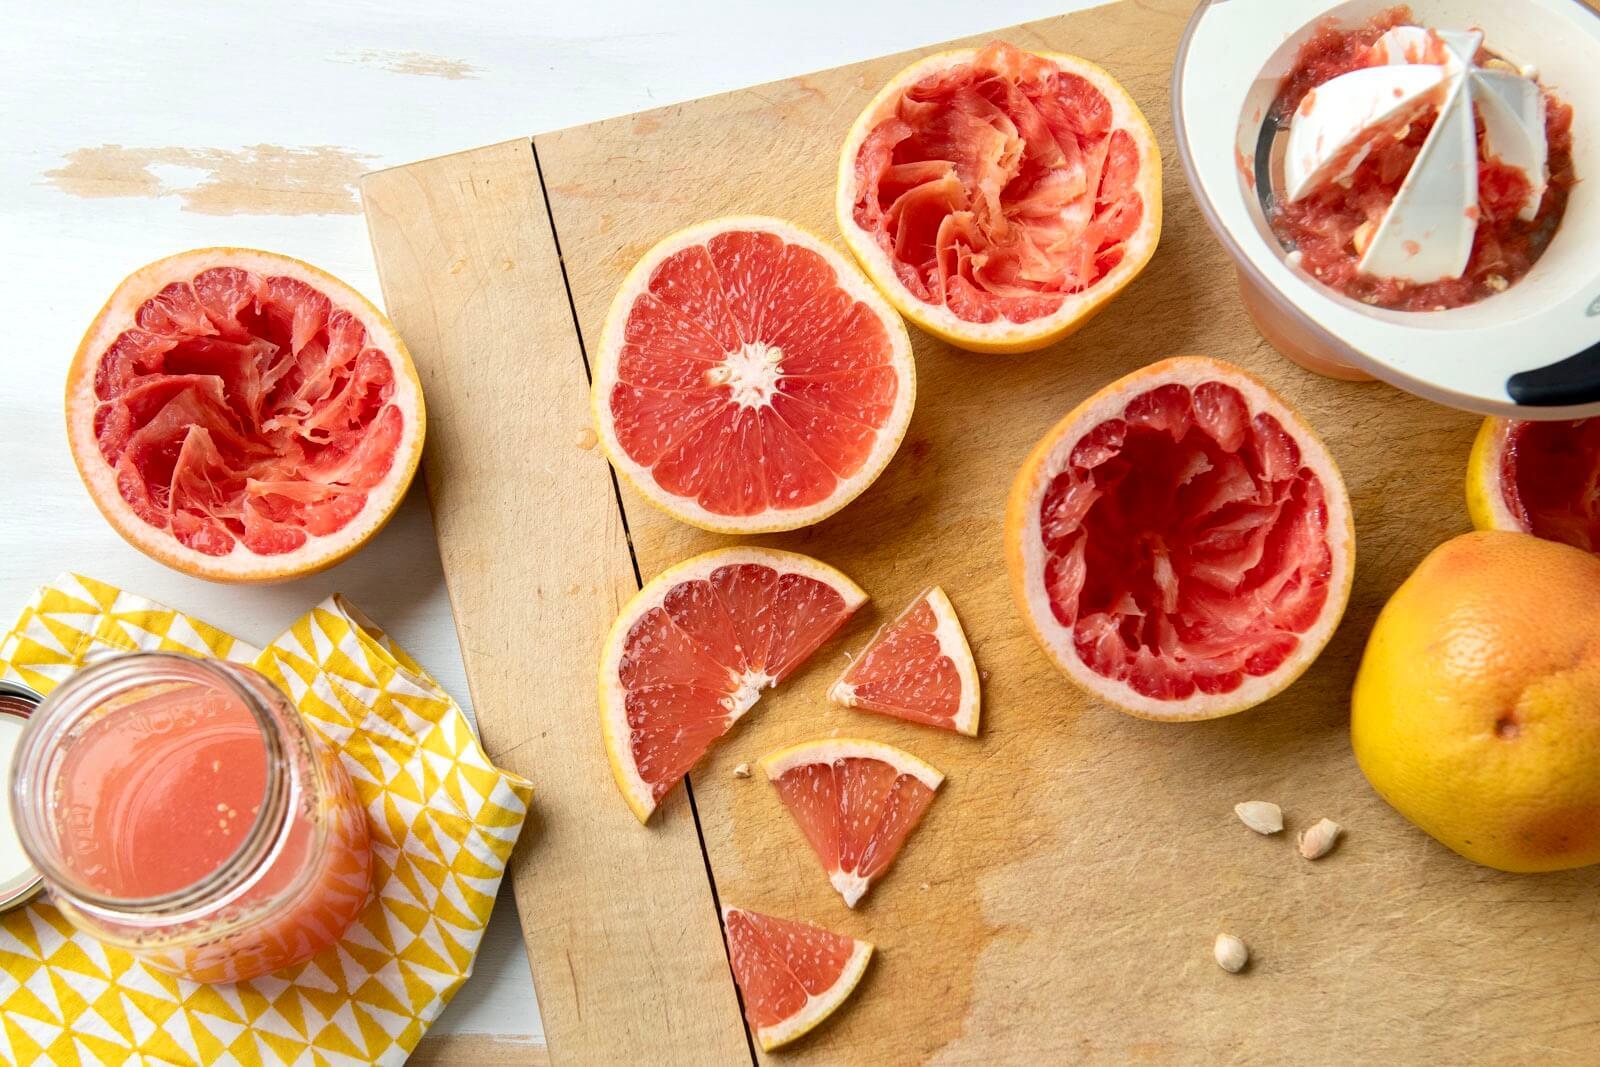 Freshly squeezed grapefruit juice